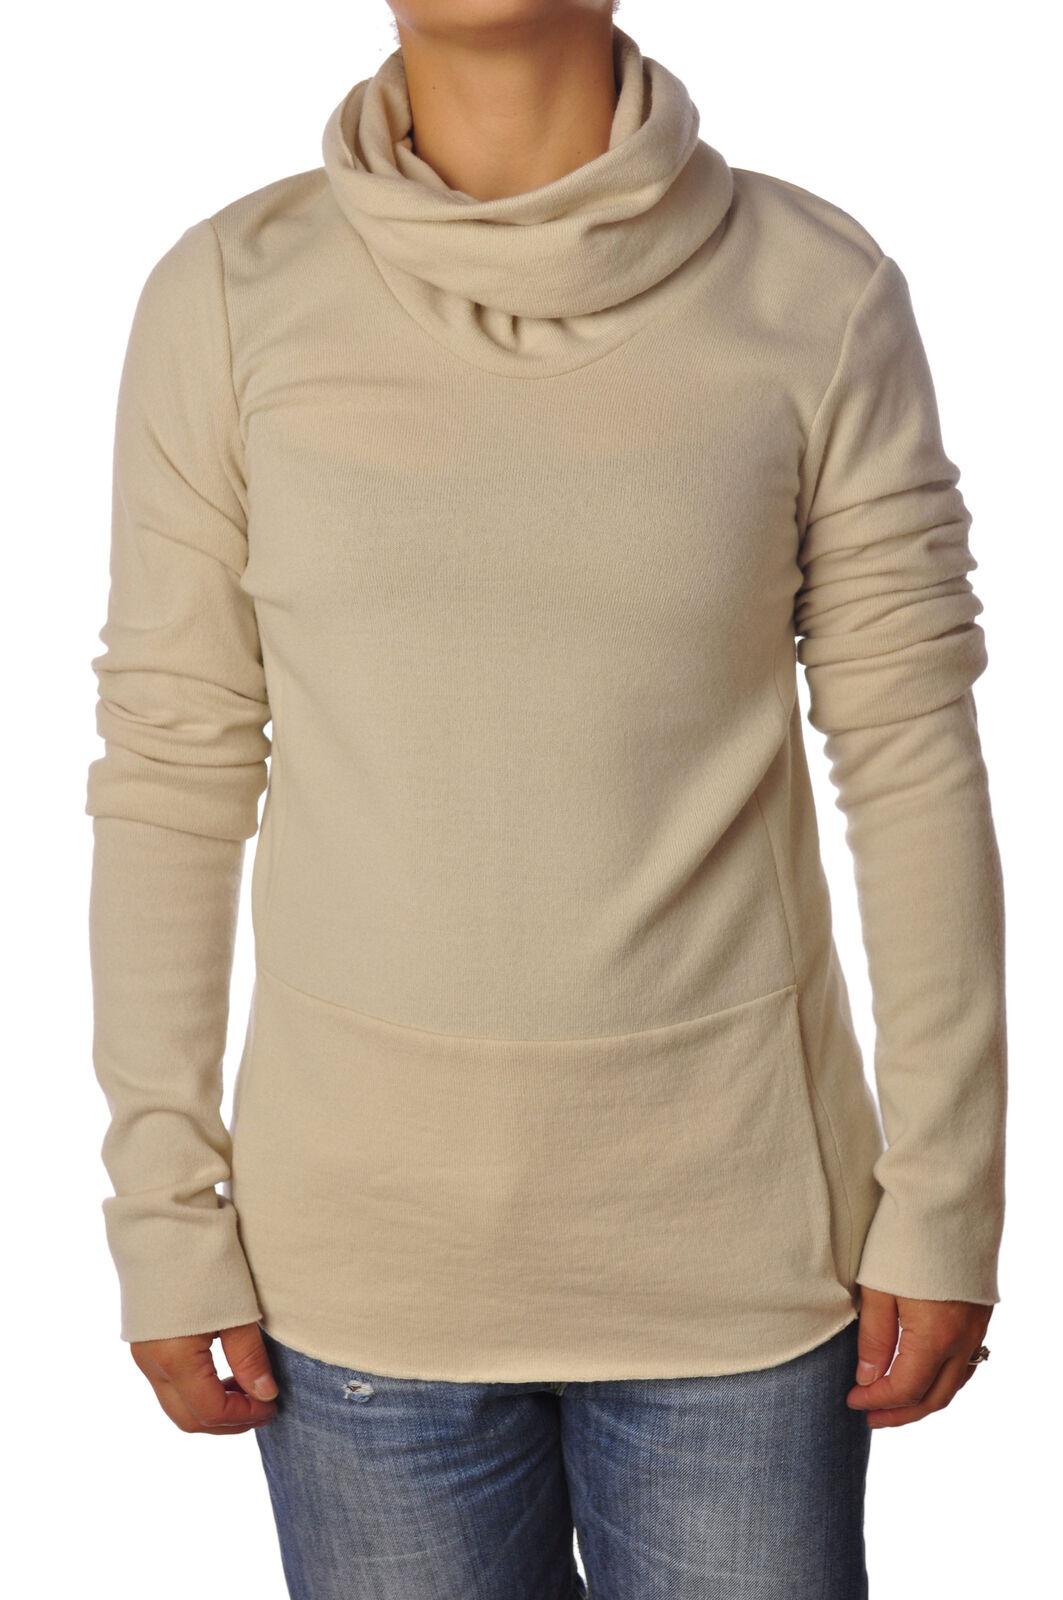 Dondup  -  Polo-Hälse - Weiblich - Beige  - 3952831A185553  alta calidad